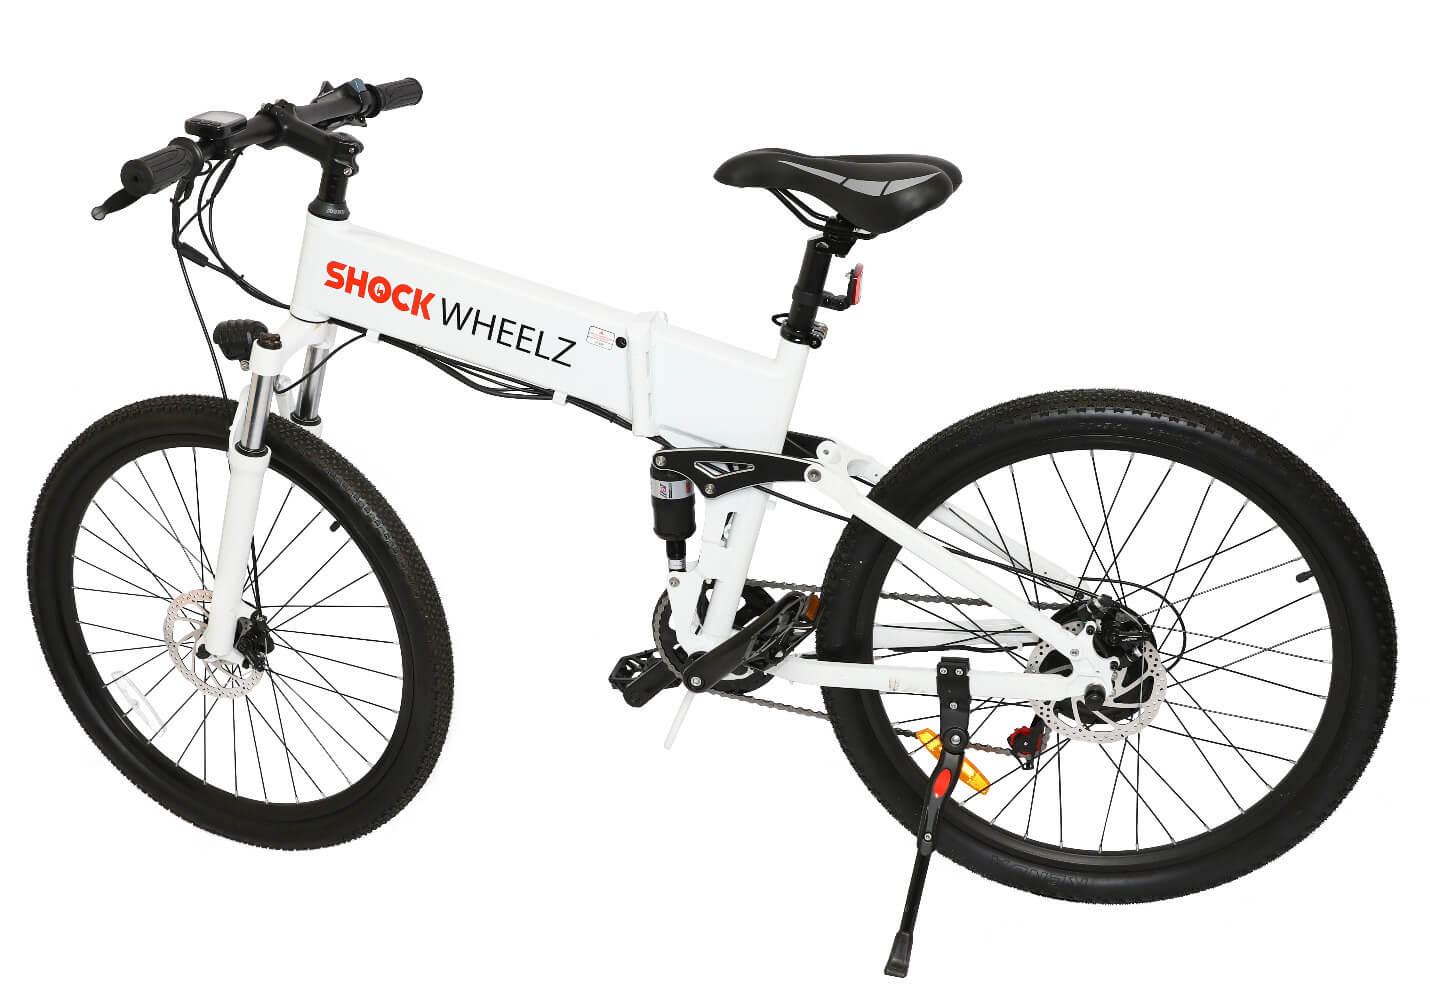 Shock Wheelz™ Electric Bike - White E-Bike